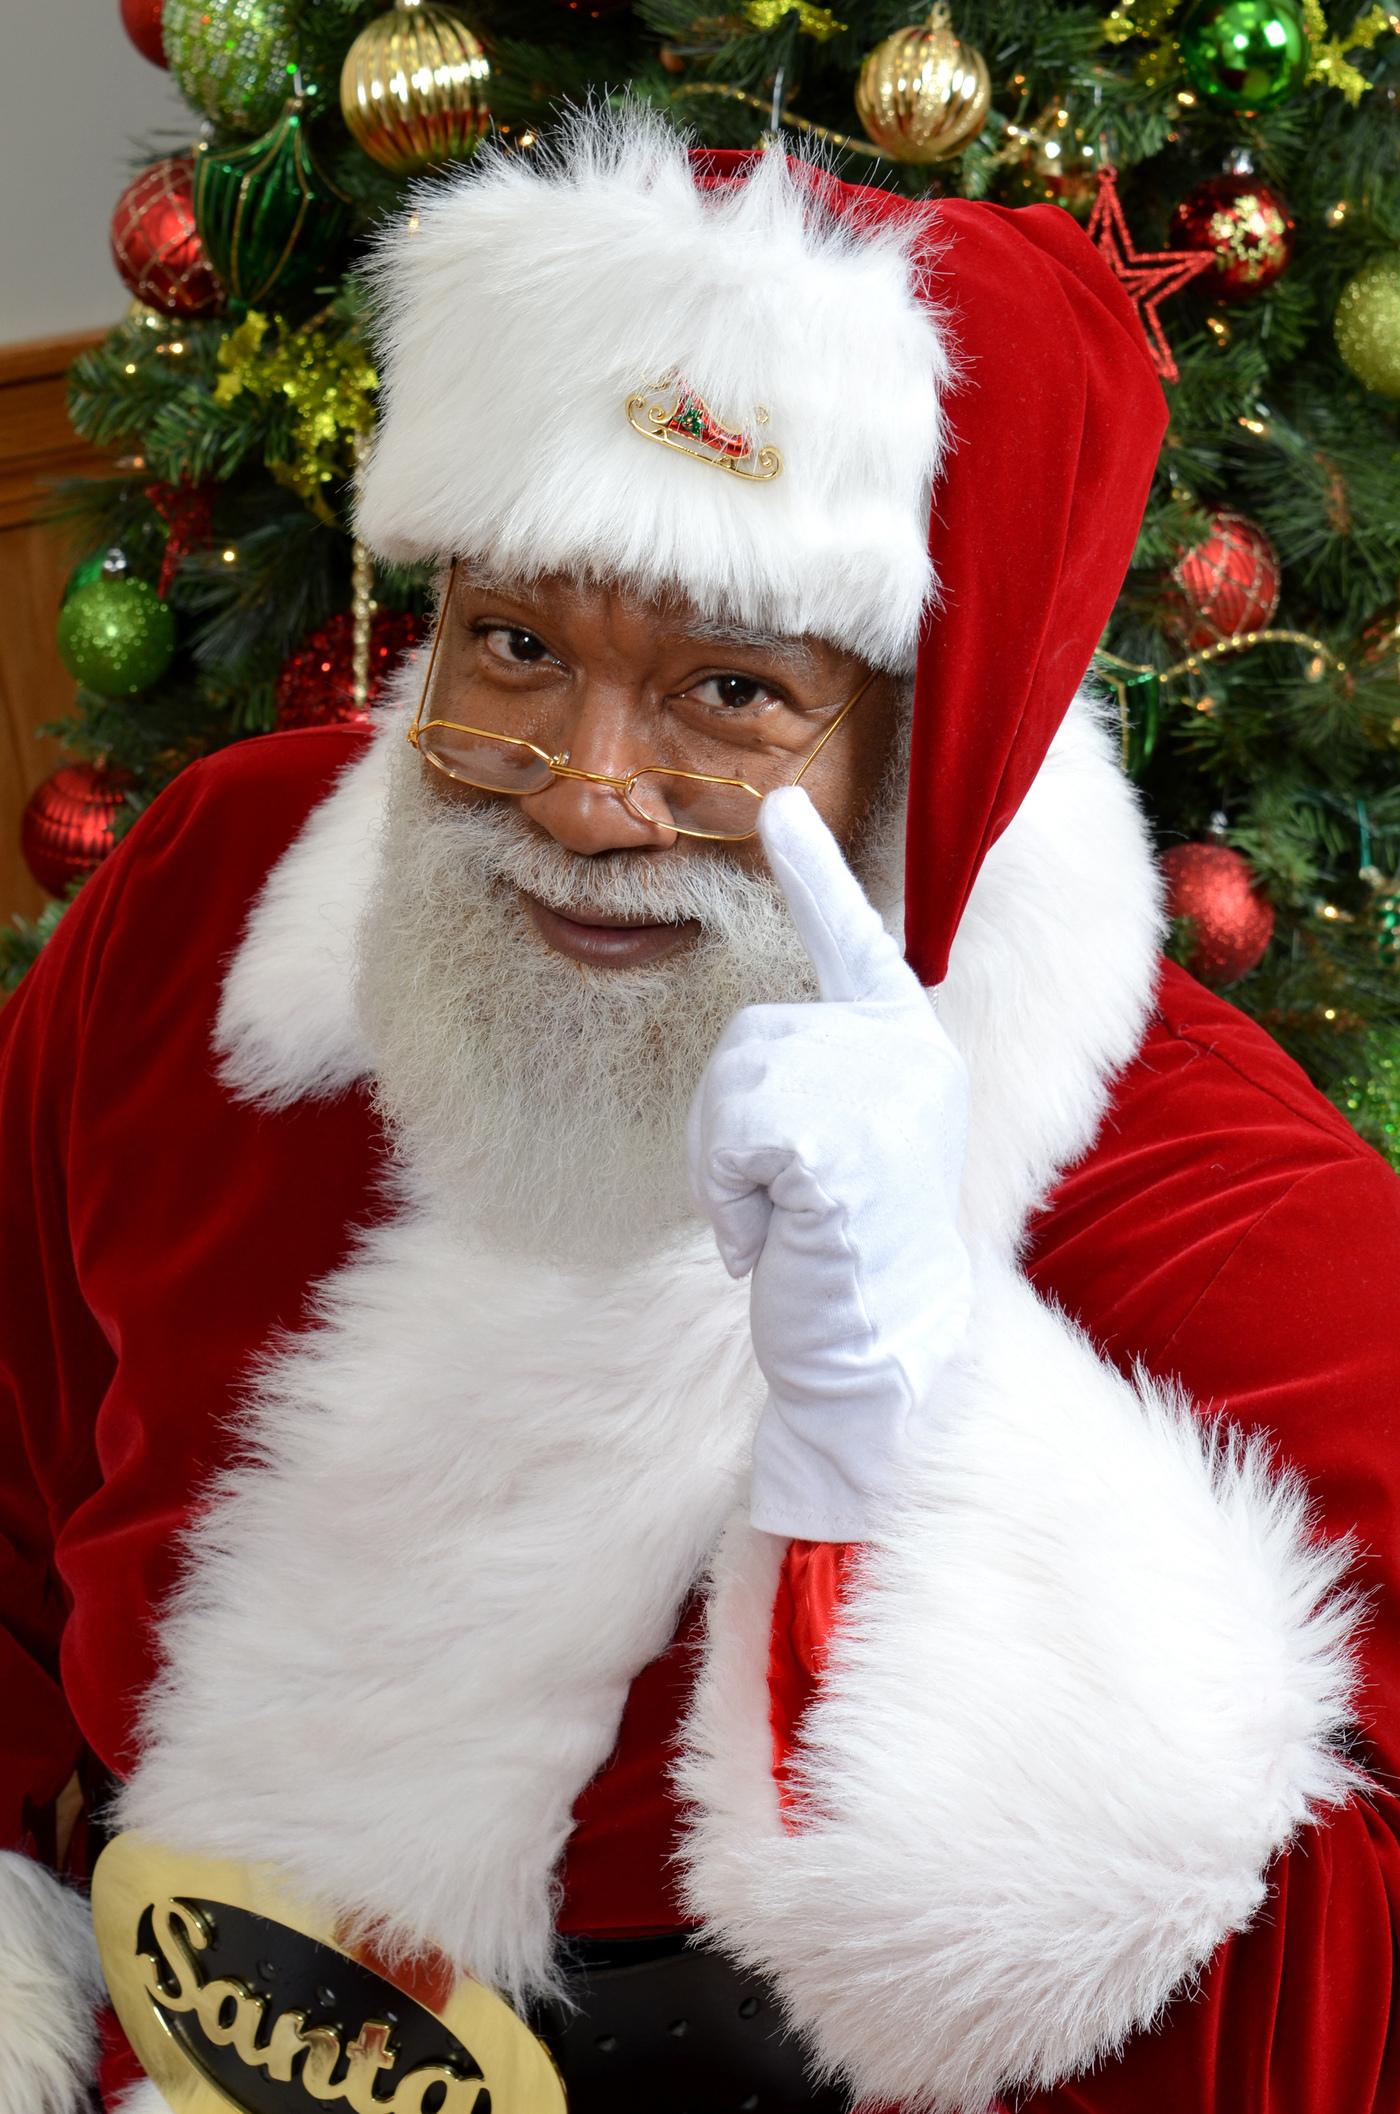 Santa claus images 55